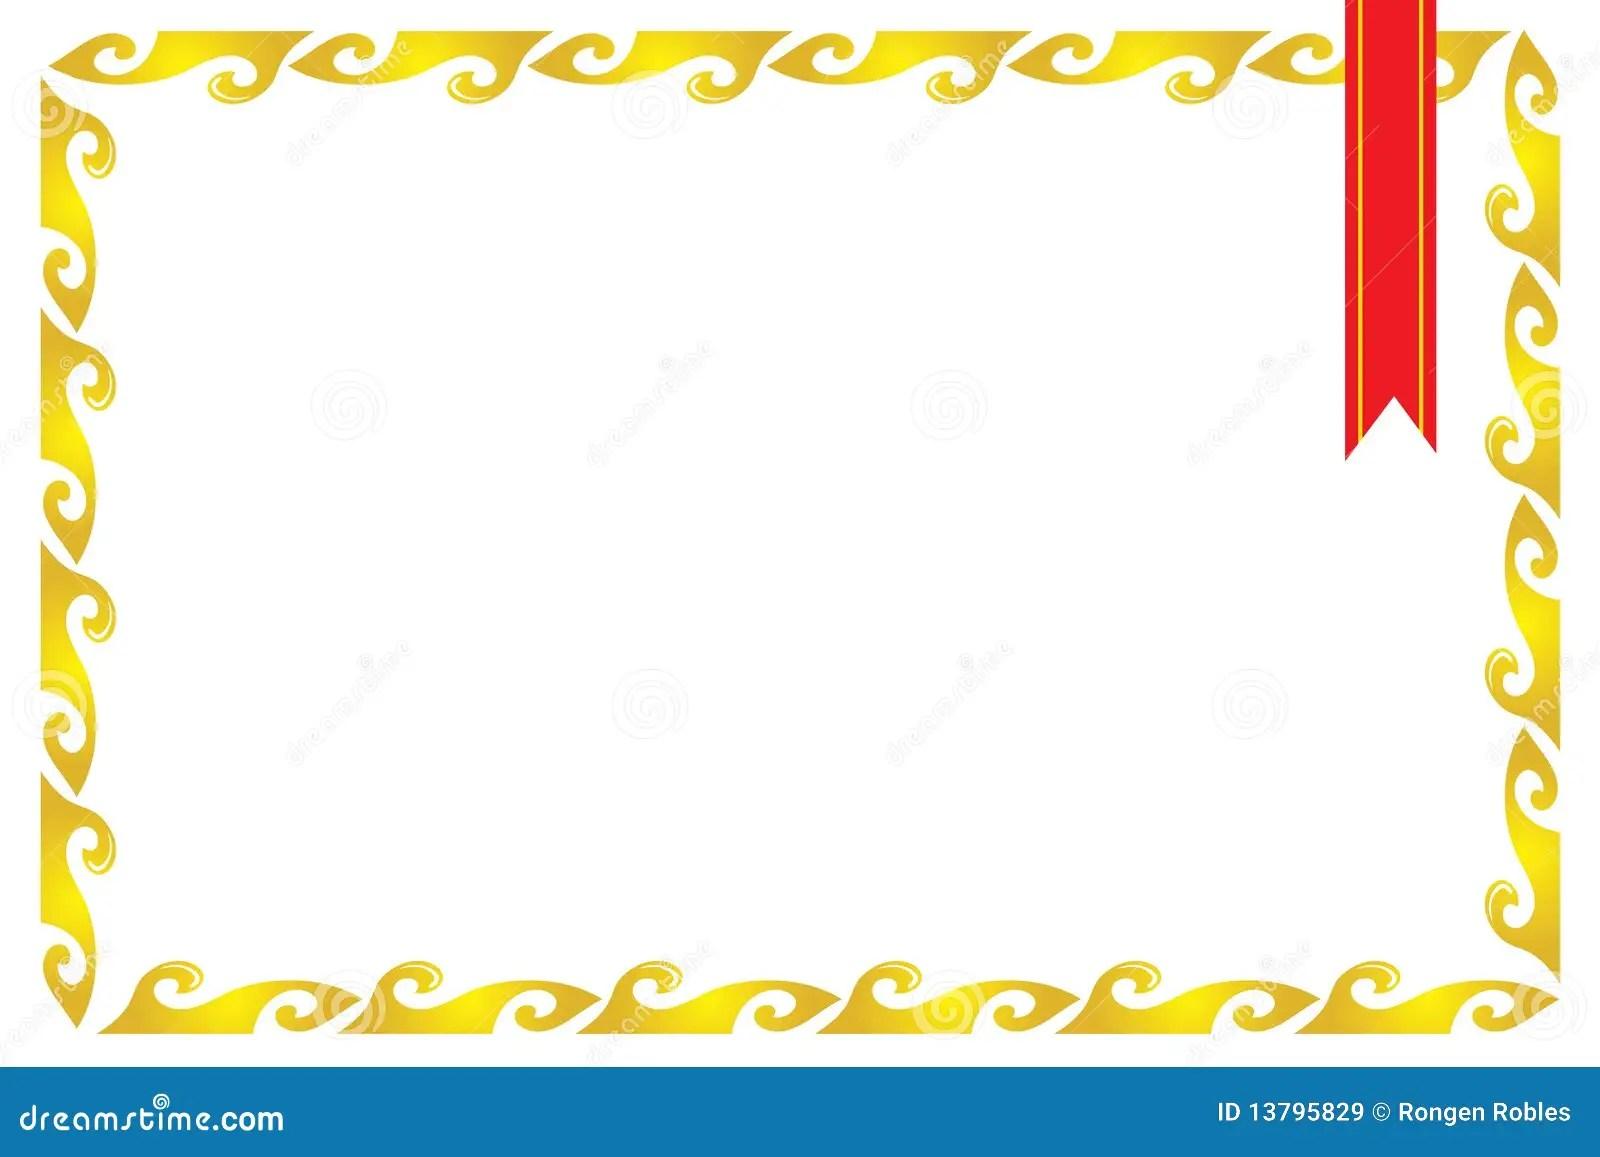 Blank Certificate Border Template | animalgals